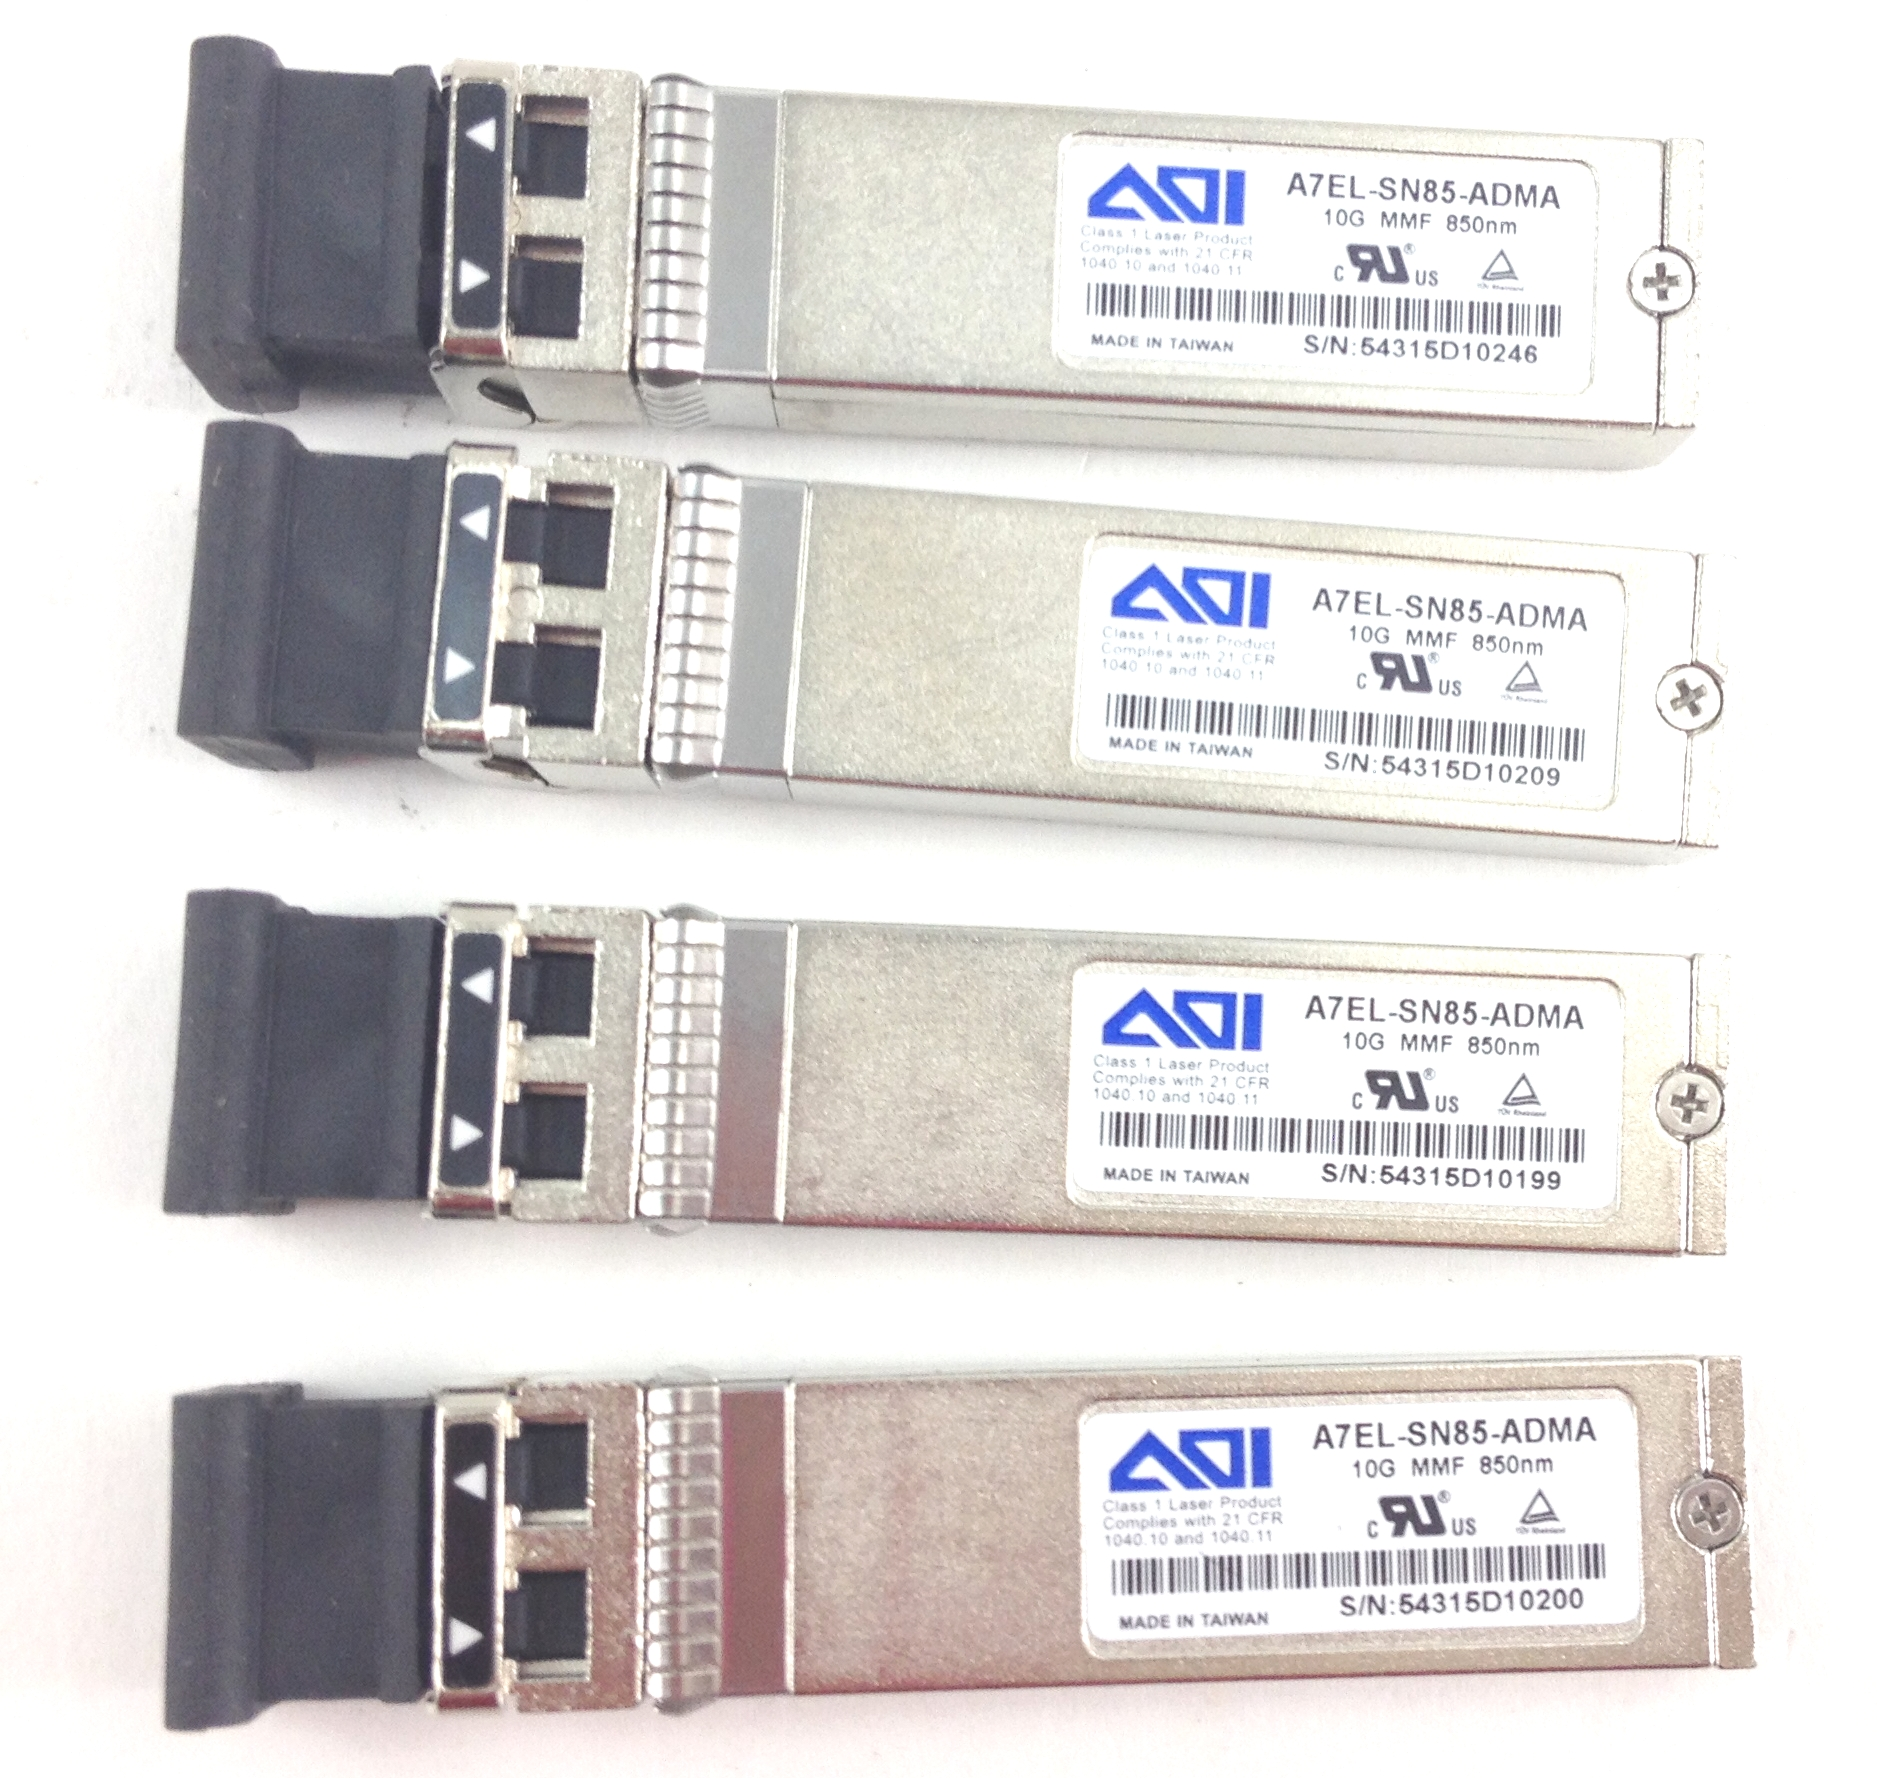 Transceiver Dual LC AOI A7EL-SN85-ADMA 10GB 850nm MMF SFP TESTED